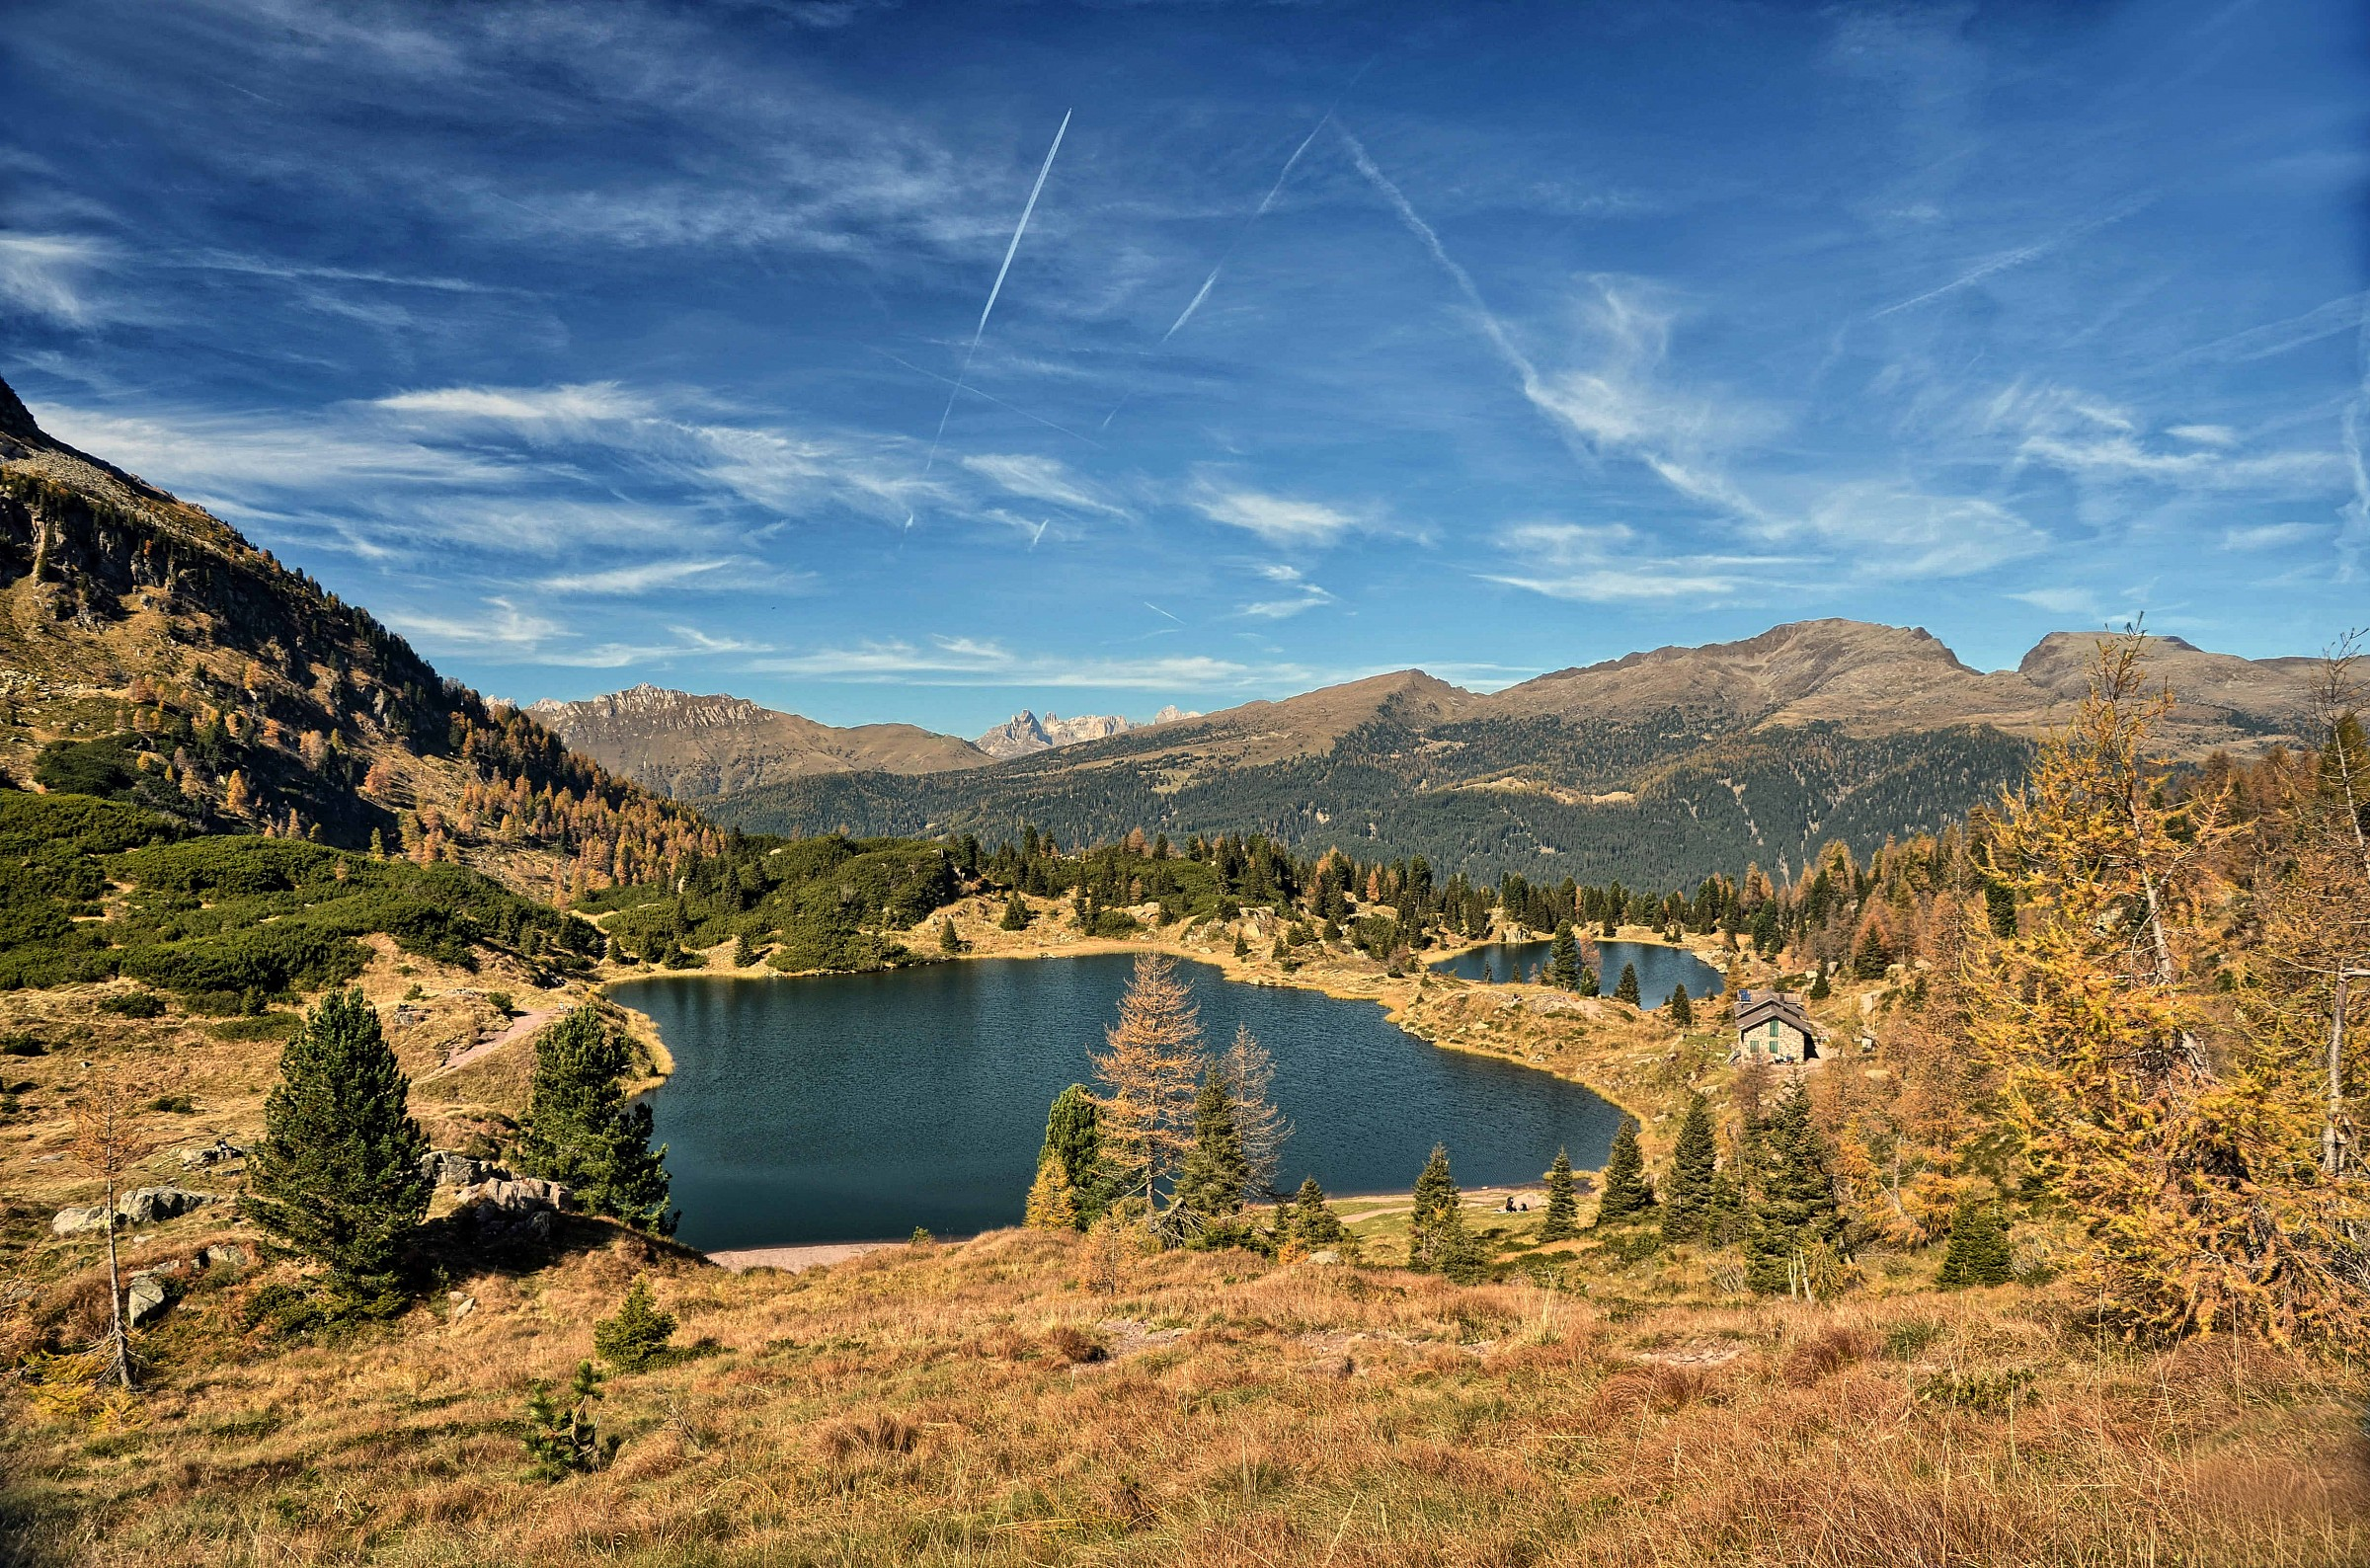 Lakes Colbricon...